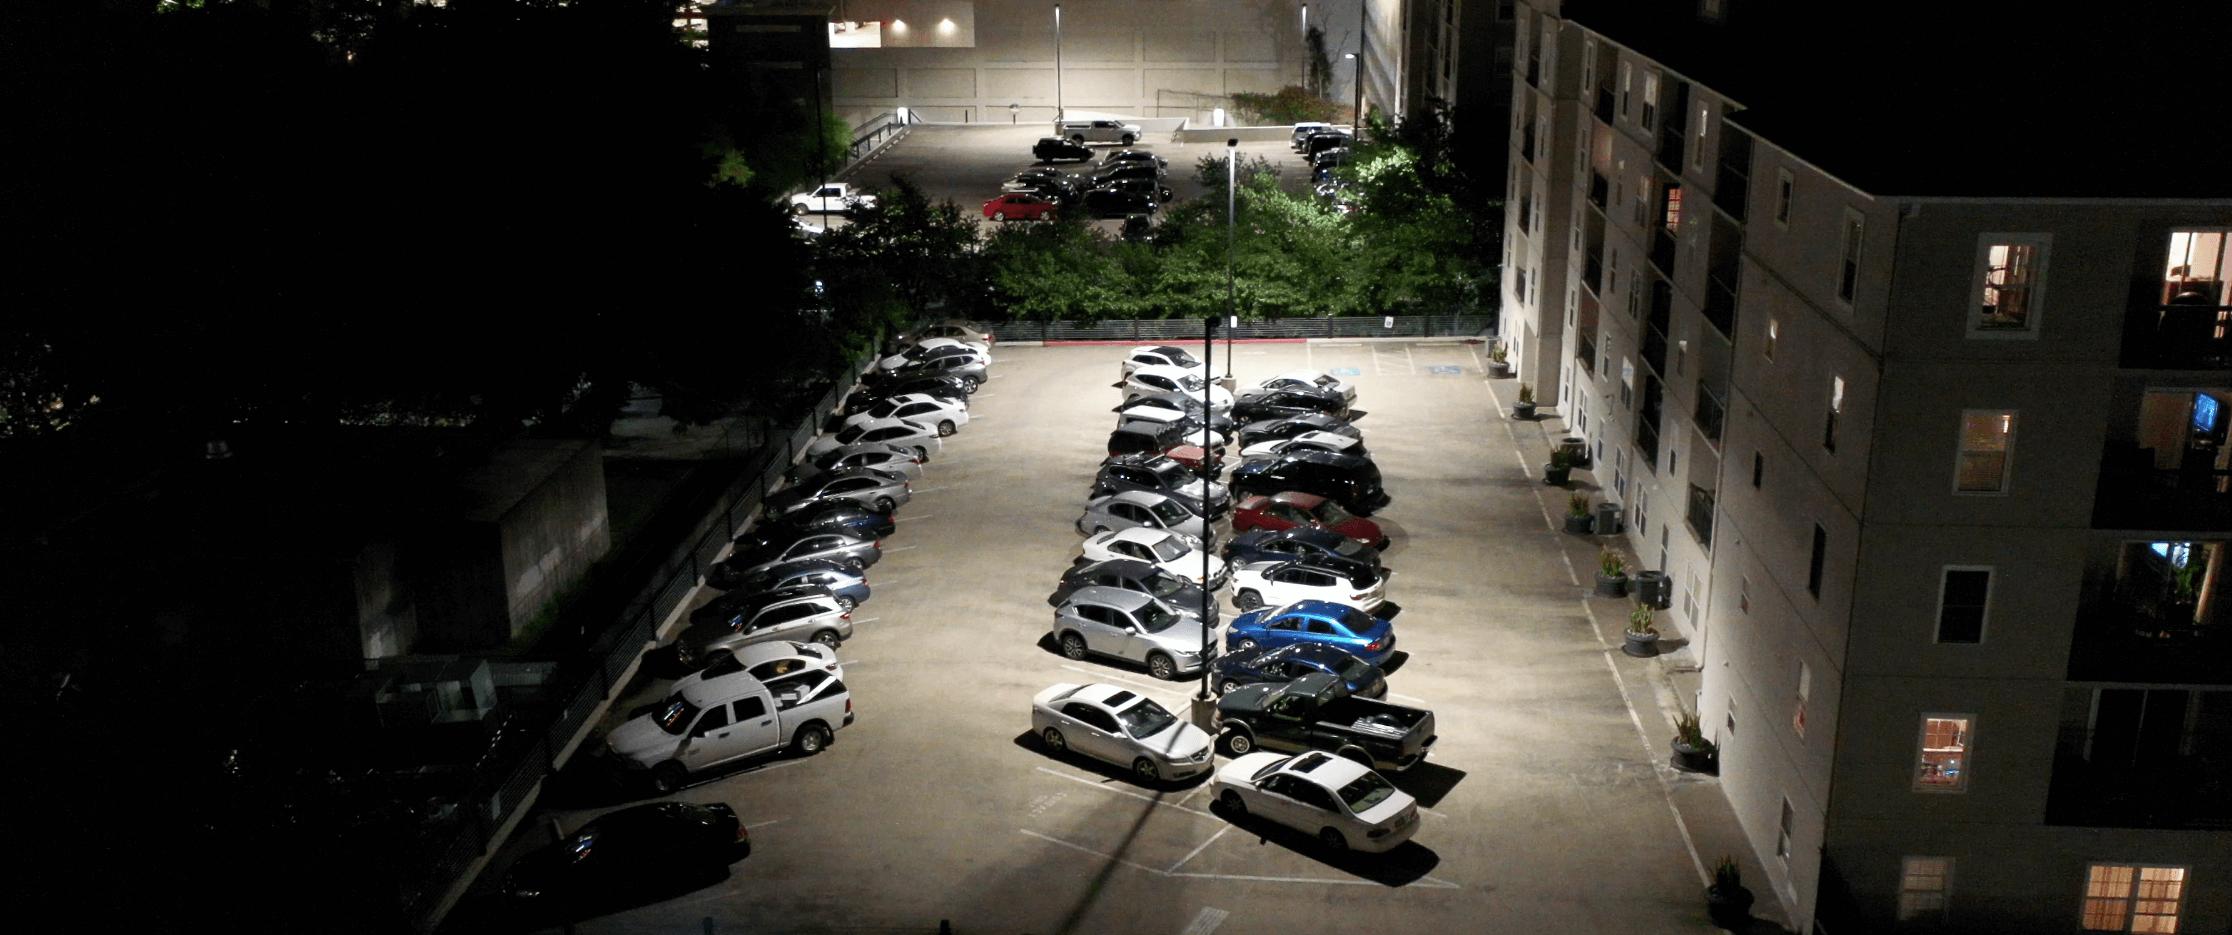 LED Conversion Parking deck Atlanta